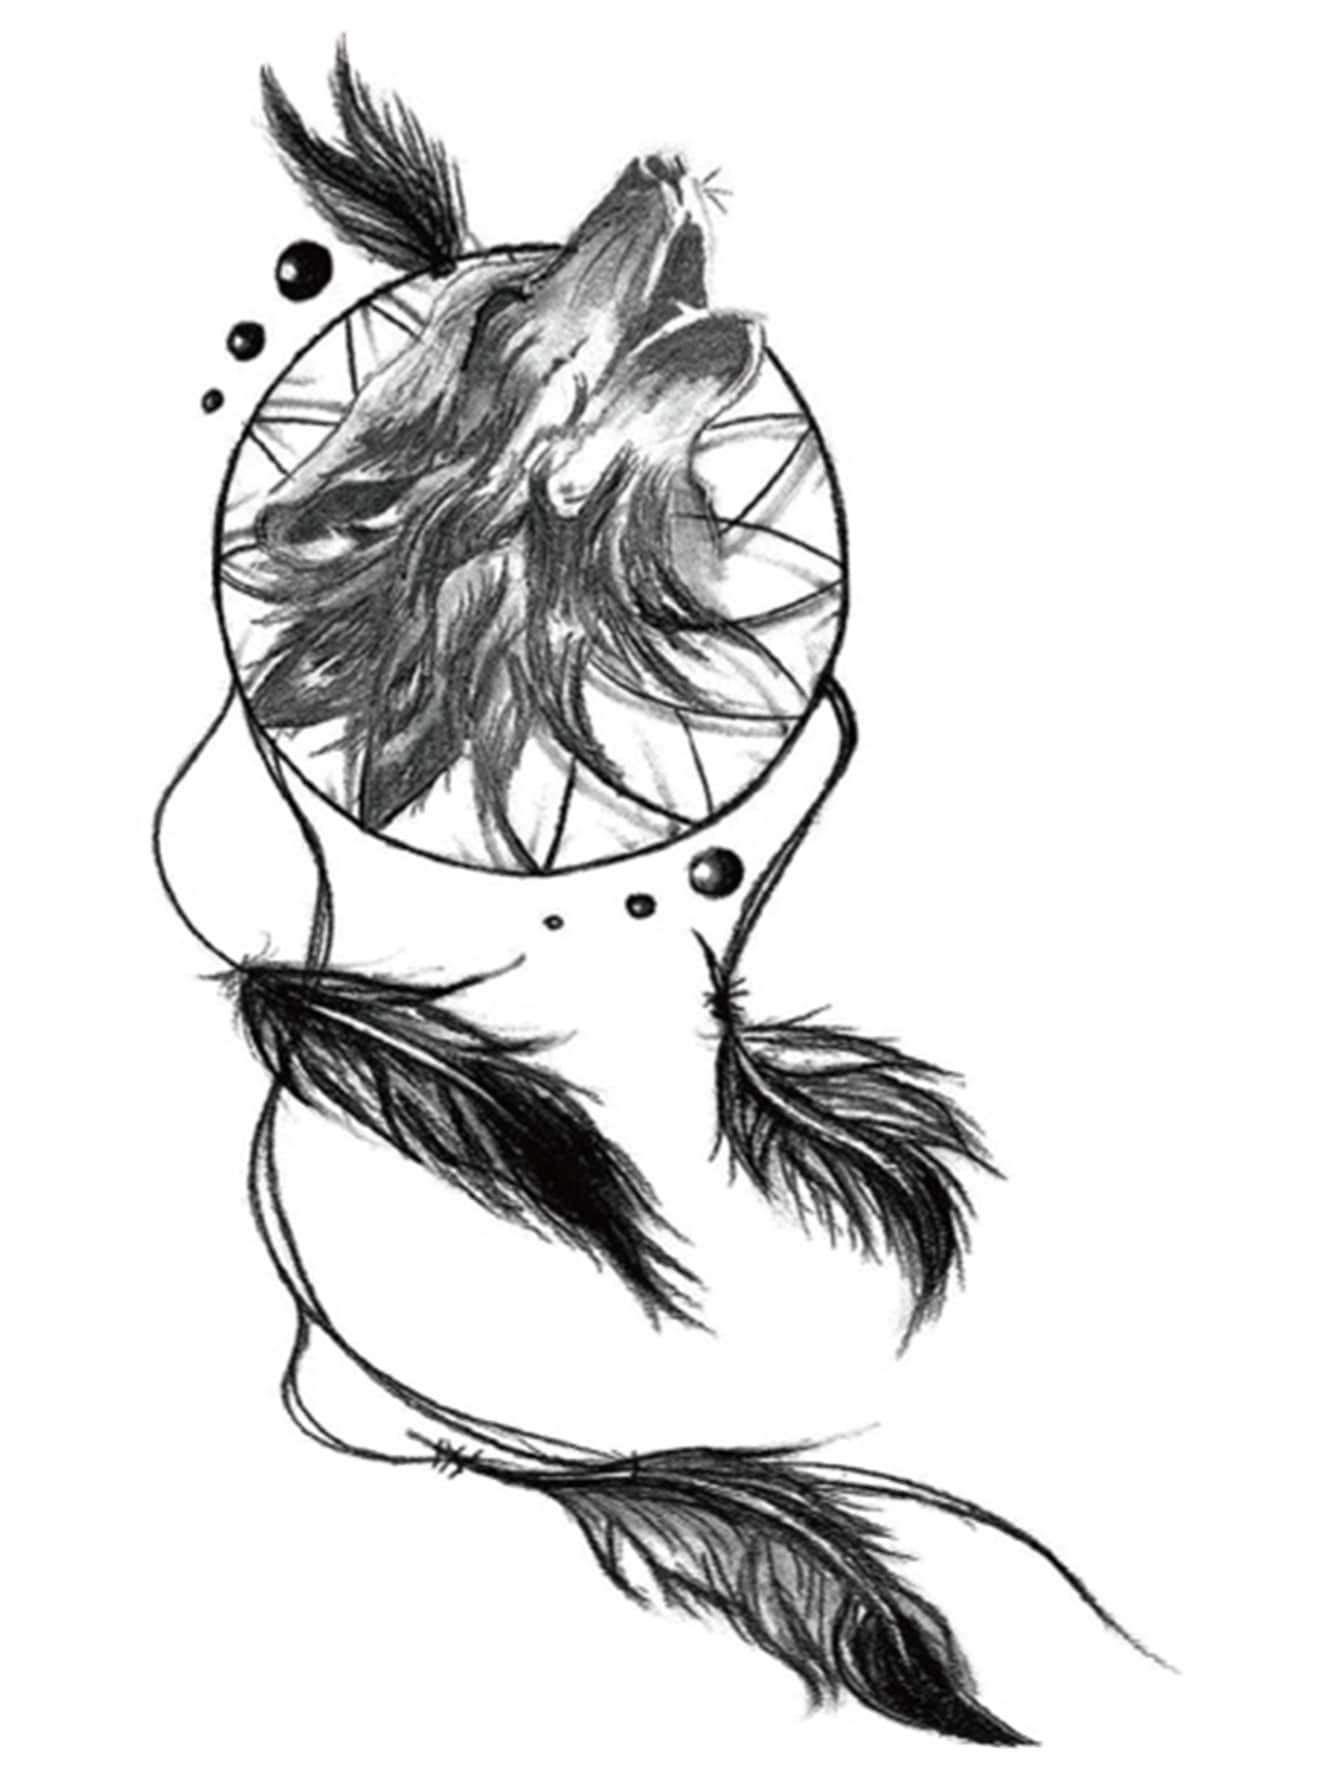 Dreamcatcher Pattern Tattoo Sticker 1sheet Wolf Dreamcatcher Tattoo Feather Tattoos Dream Catcher Tattoo